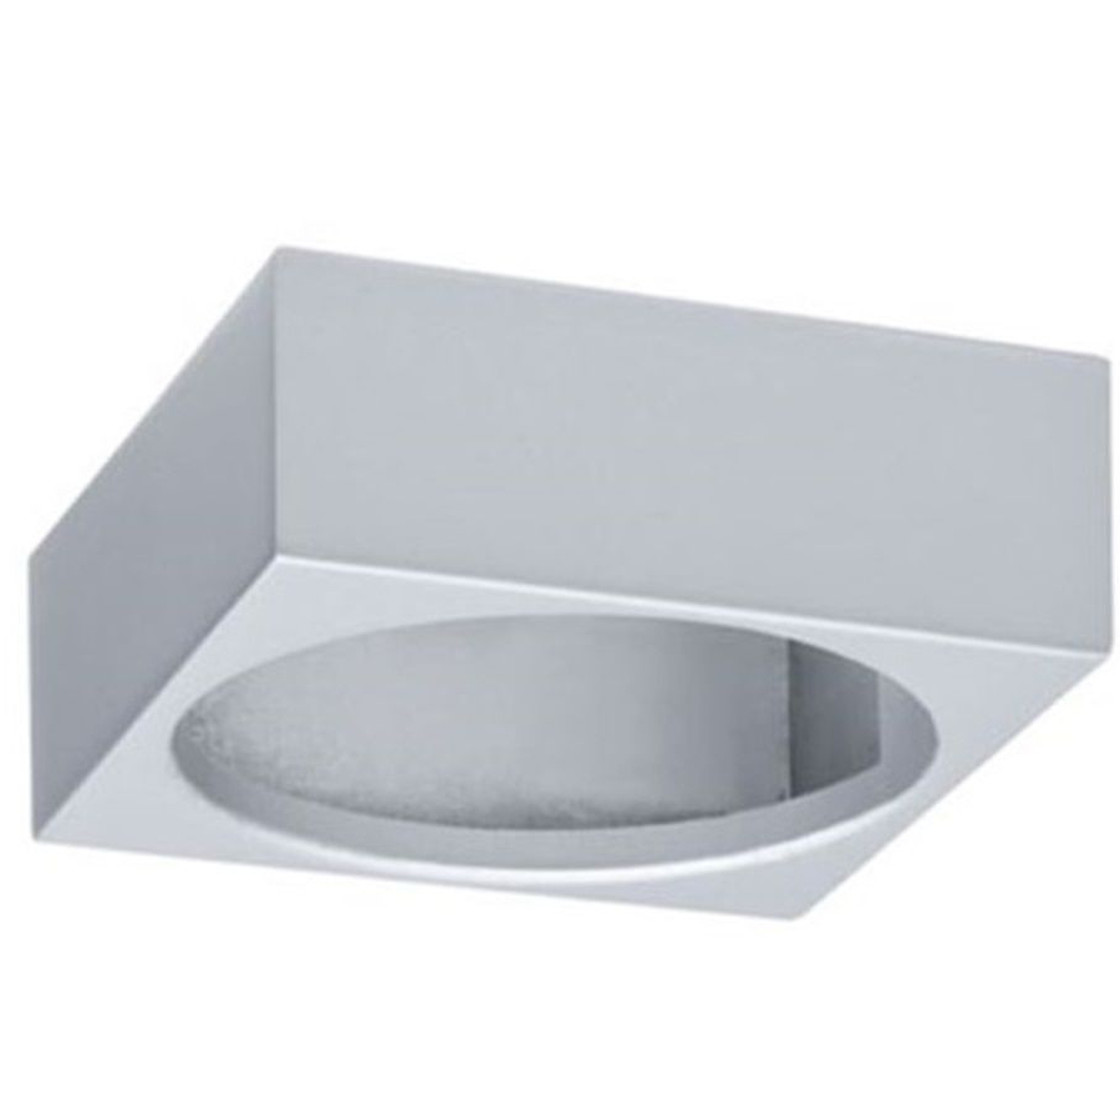 paulmann micro line m belaufbauring f r quadro ebl e. Black Bedroom Furniture Sets. Home Design Ideas